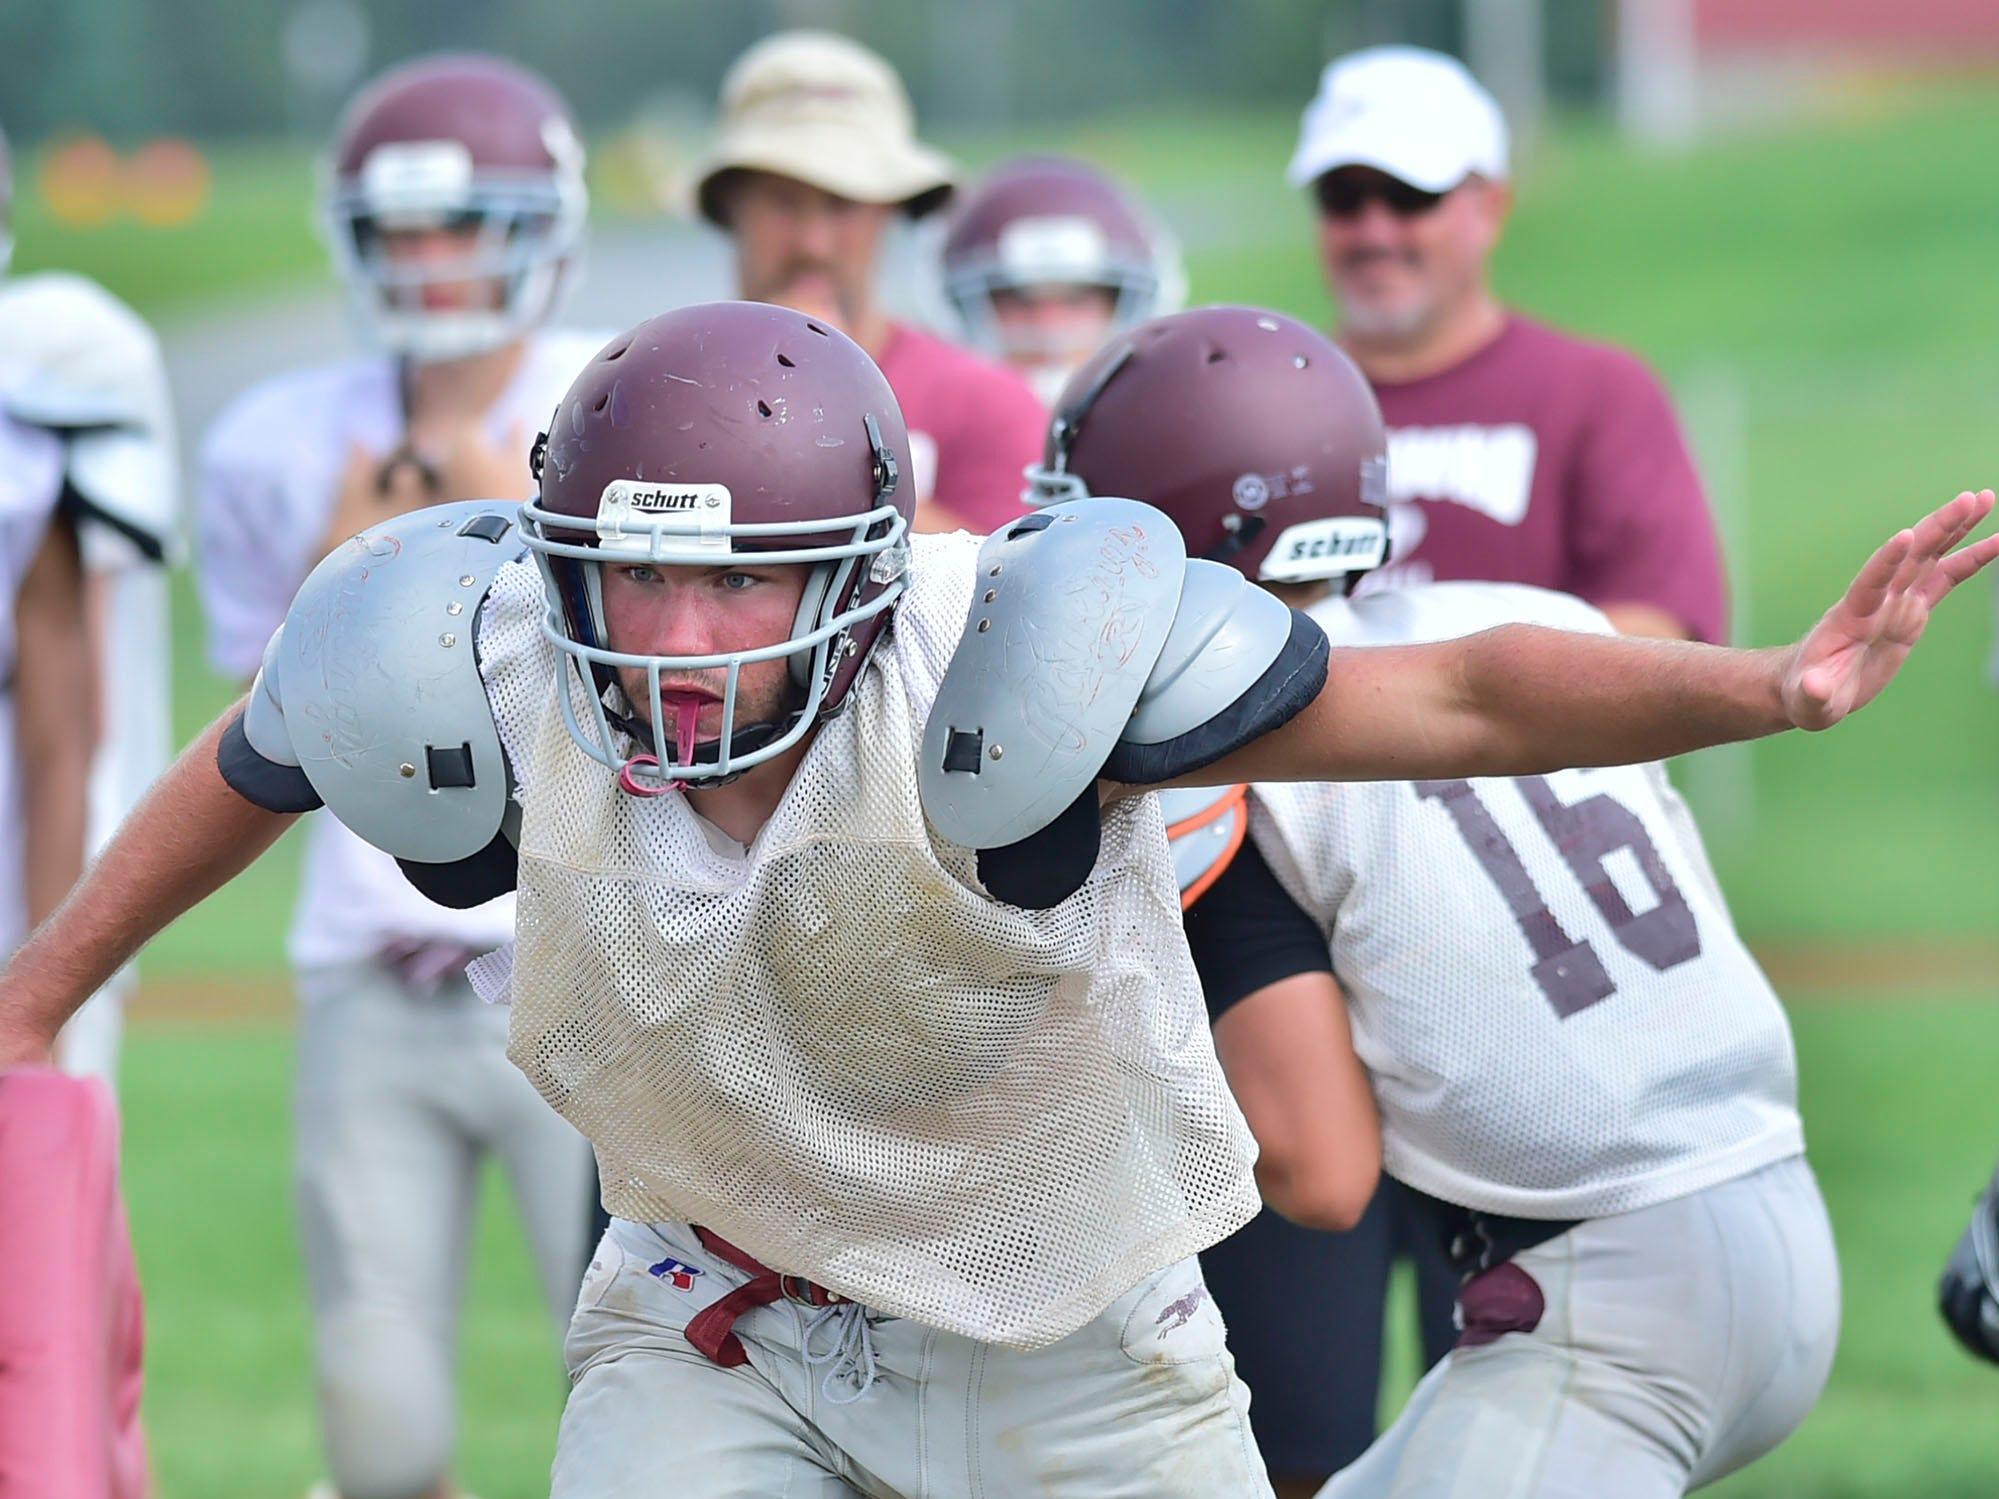 Shippensburg High School football players practice on Thursday, August 9, 2018.